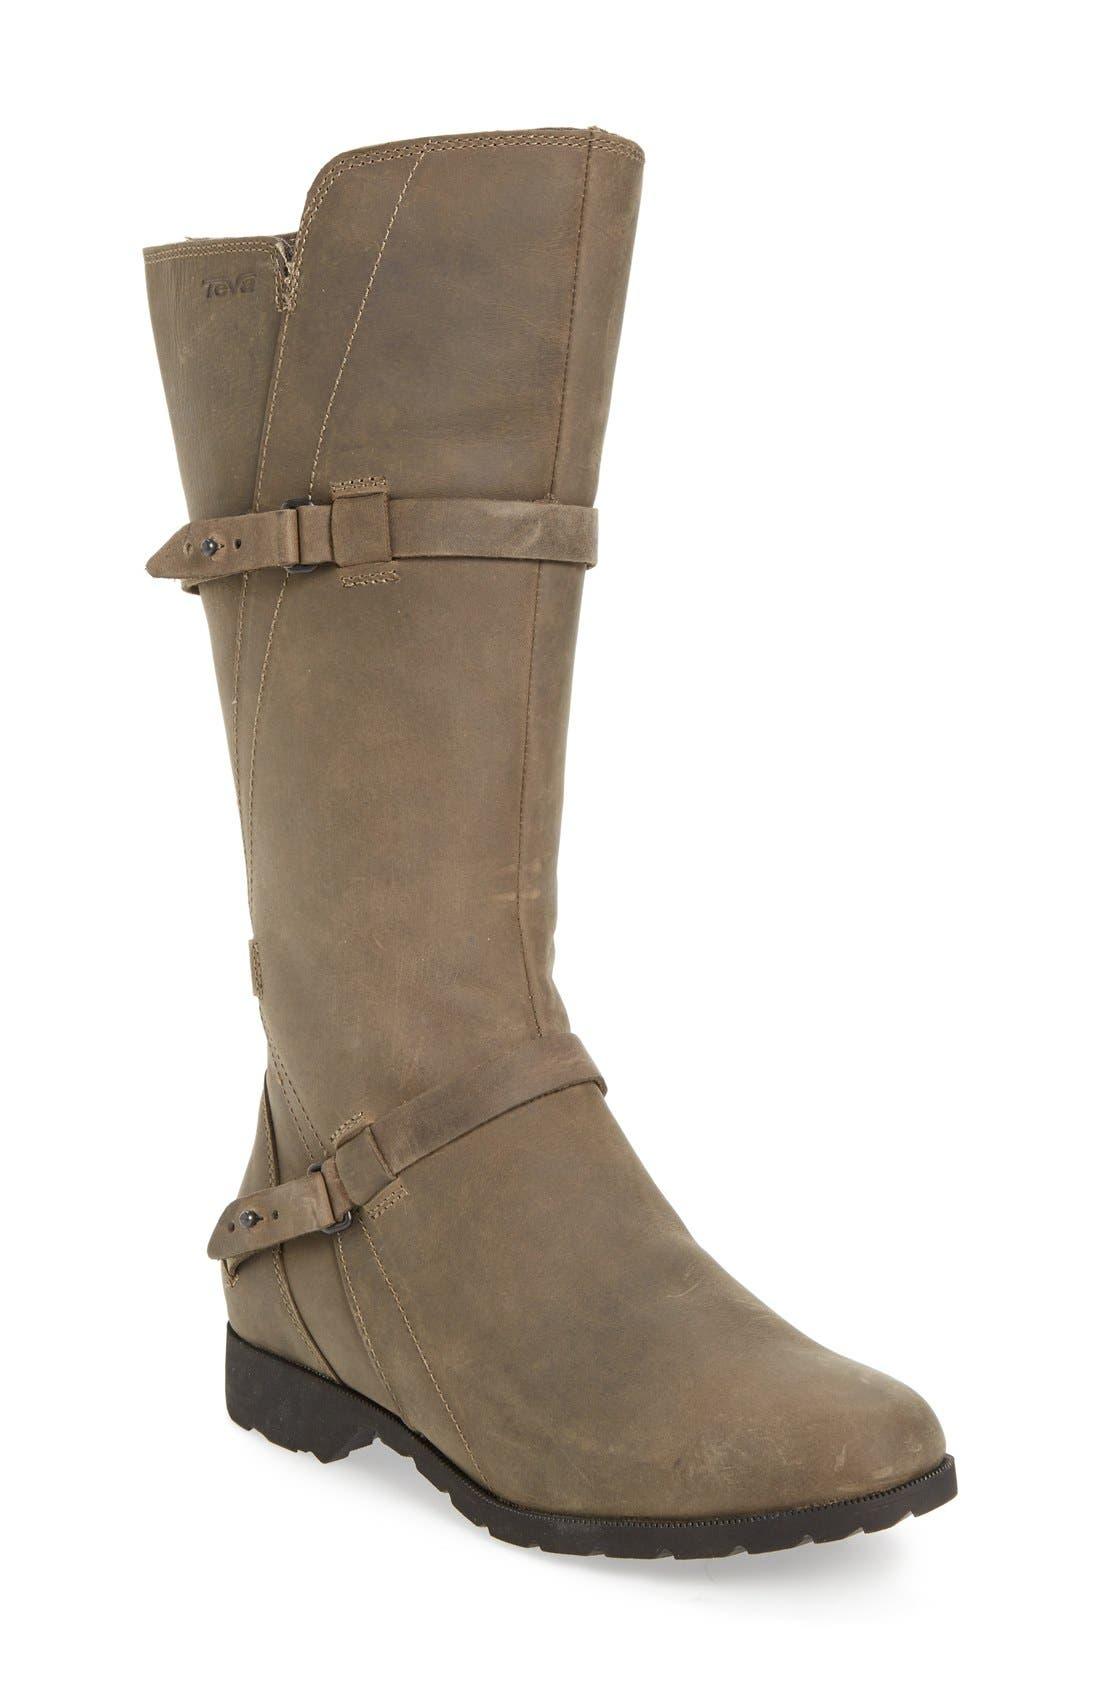 Alternate Image 1 Selected - Teva 'De La Vina' Waterproof Riding Boot (Women)